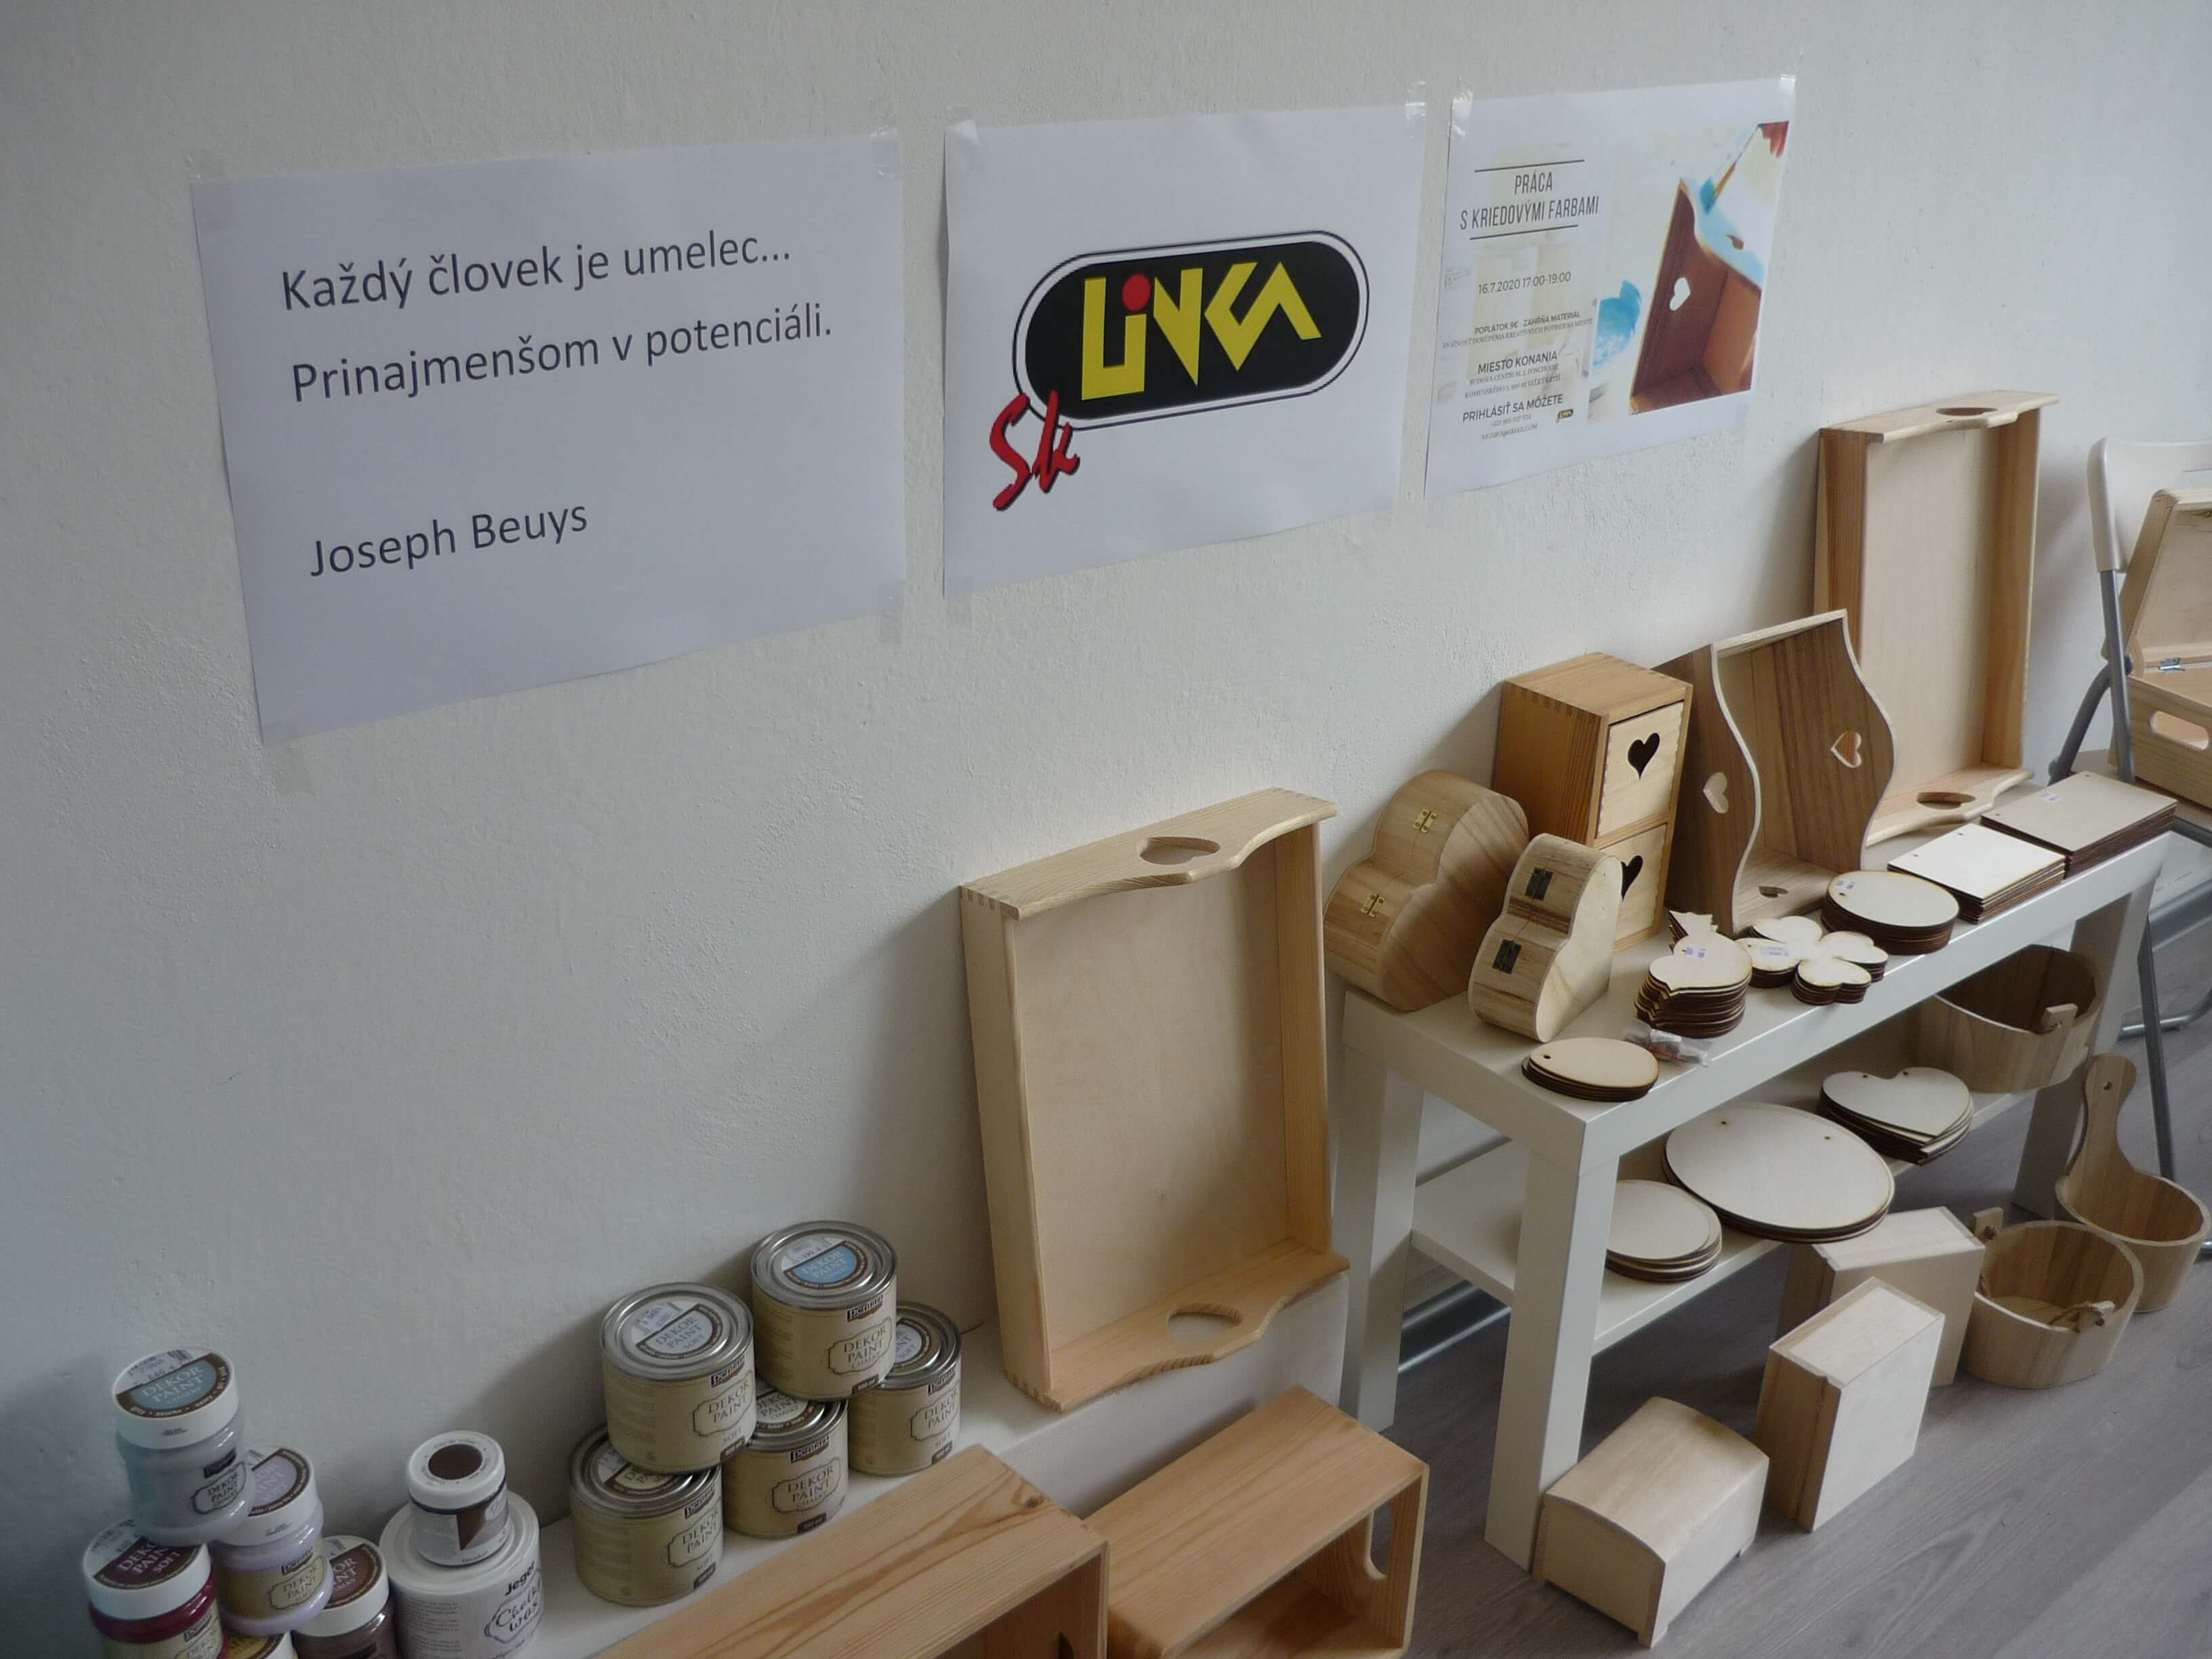 1.Workshop s Kriedovymi Farbamy VK (1).JPG